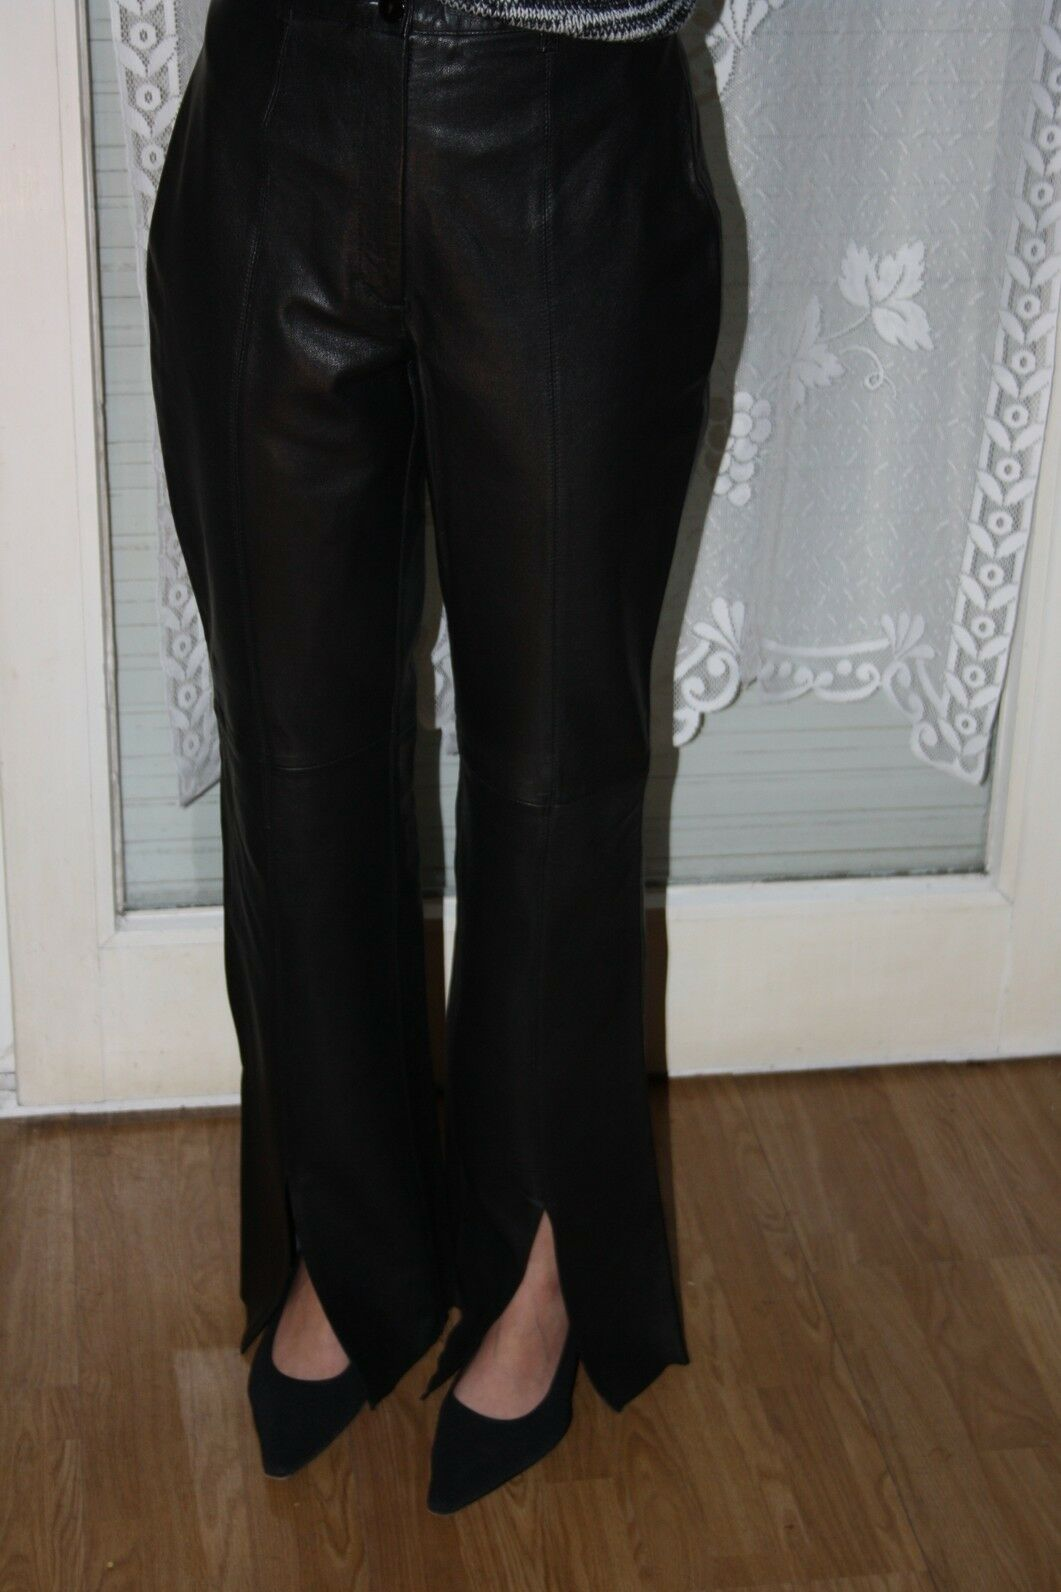 Damen Lederhose, MAX & MARY mit Schlitzen, schwarz, Gr. W30 (DE 40)